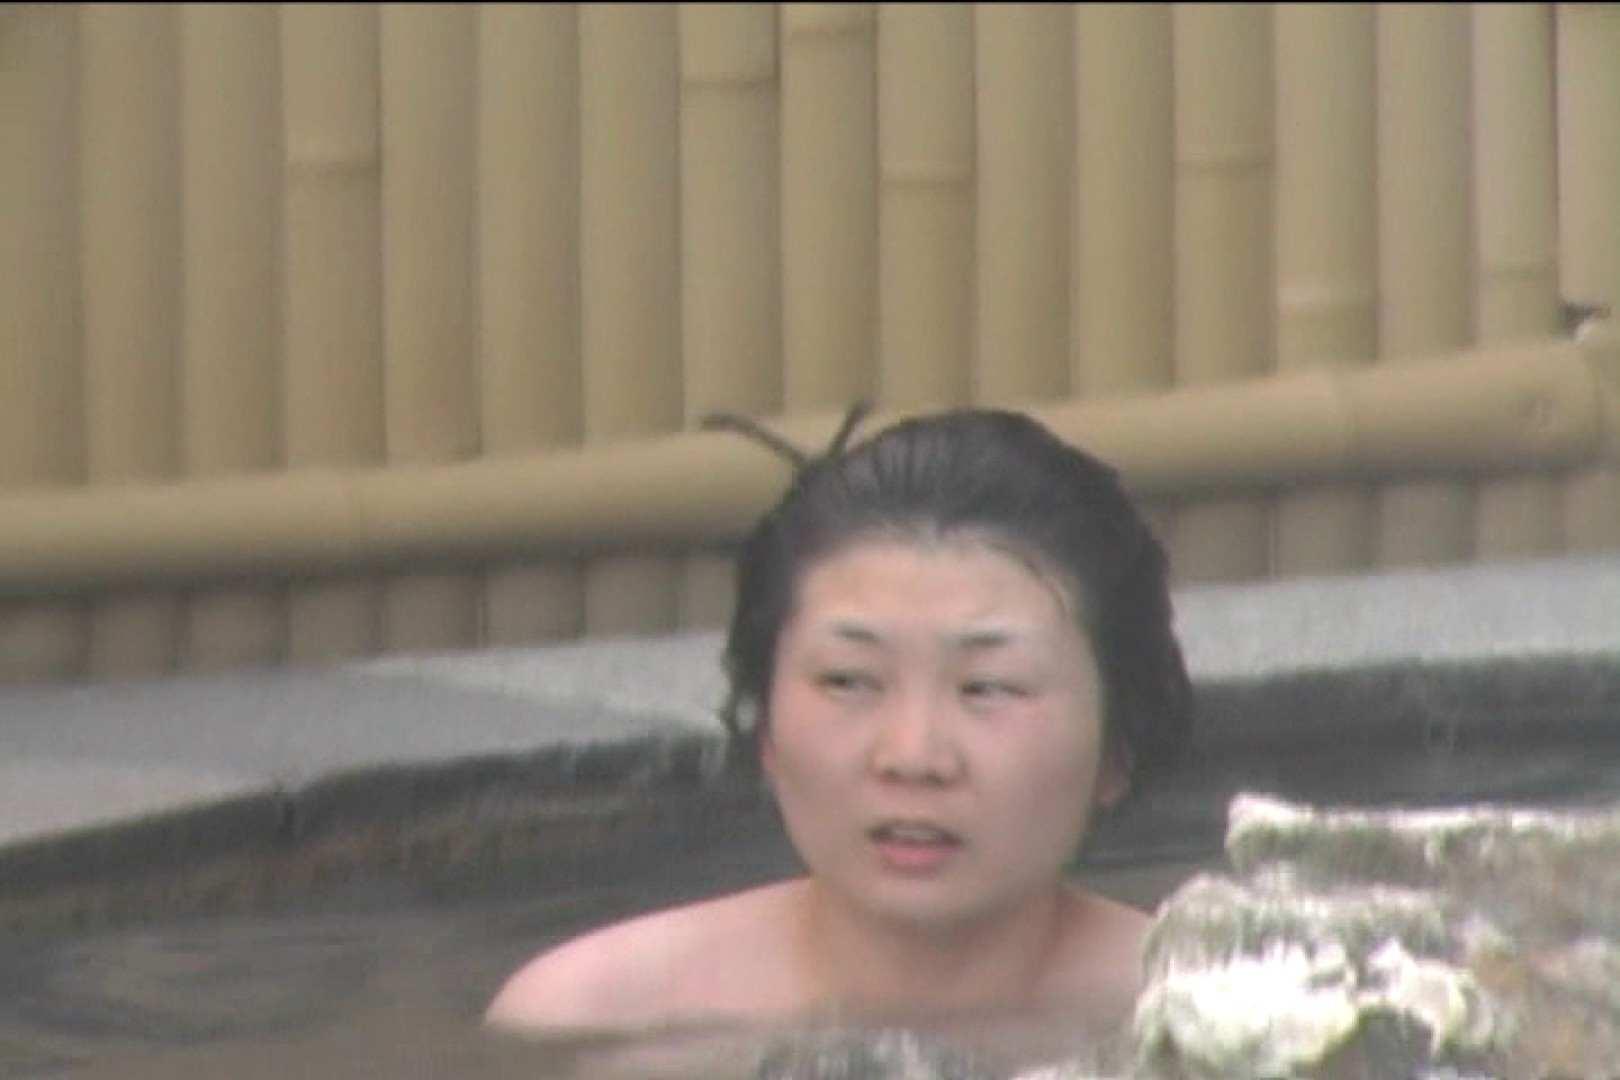 Aquaな露天風呂Vol.531 盗撮大放出 戯れ無修正画像 90連発 48